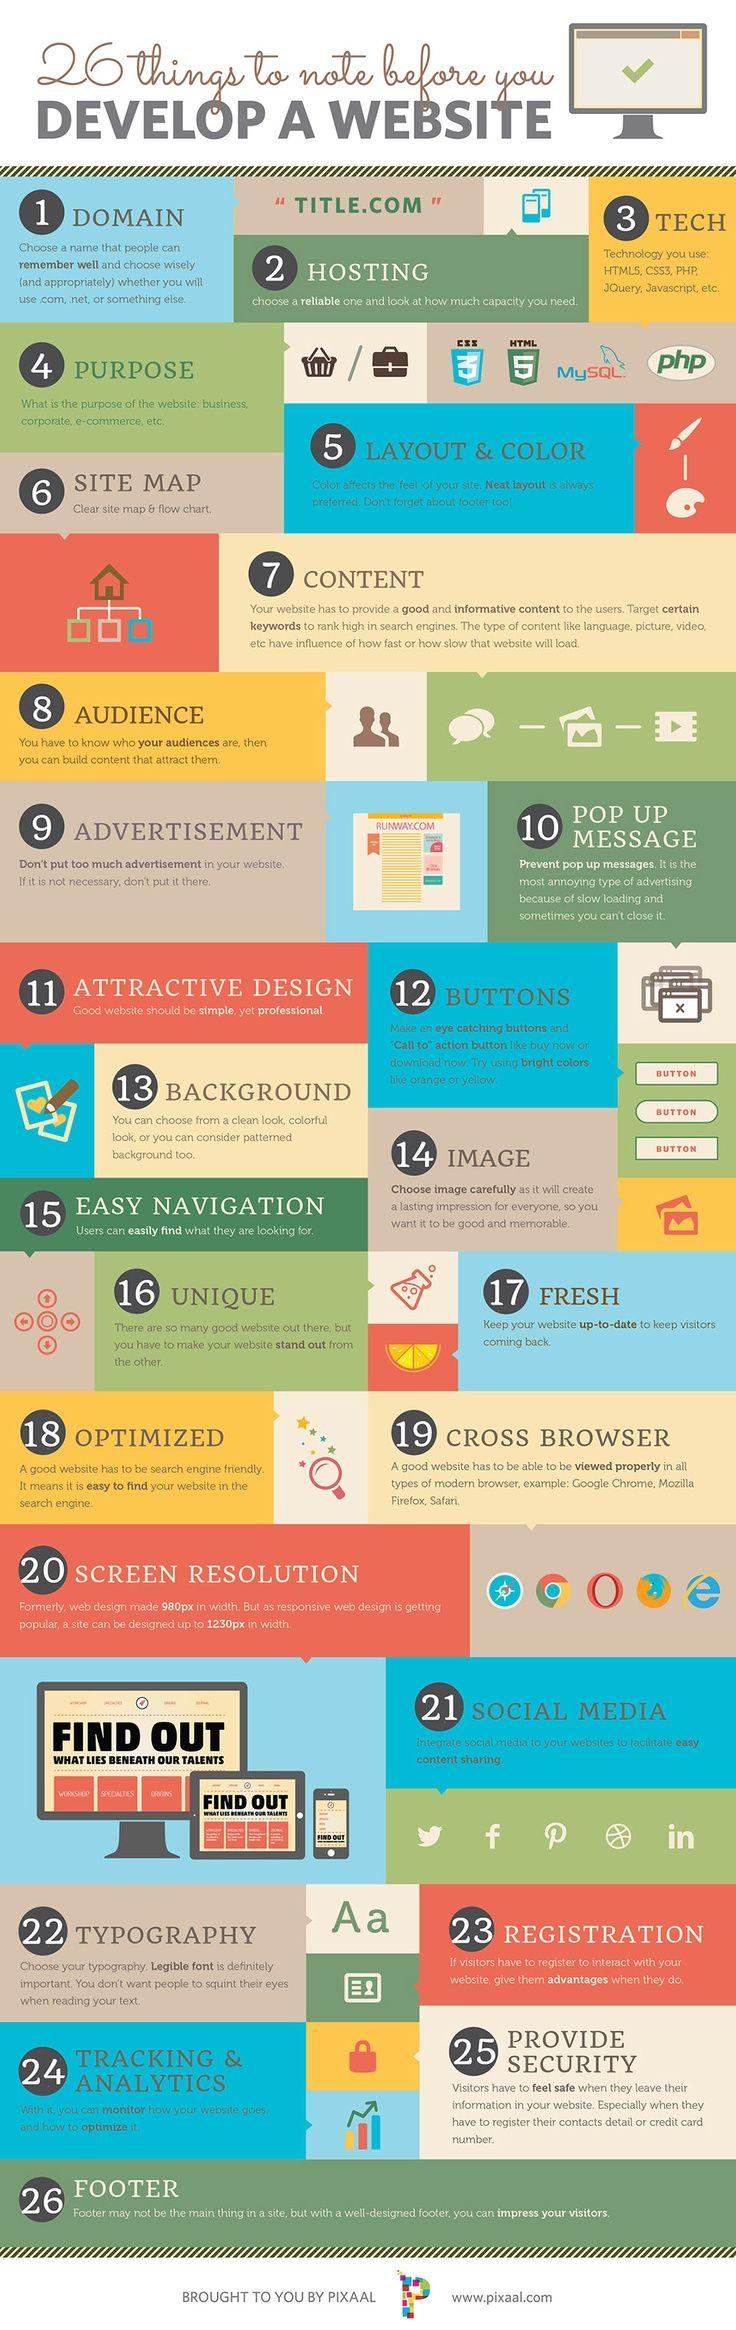 Web site design steps